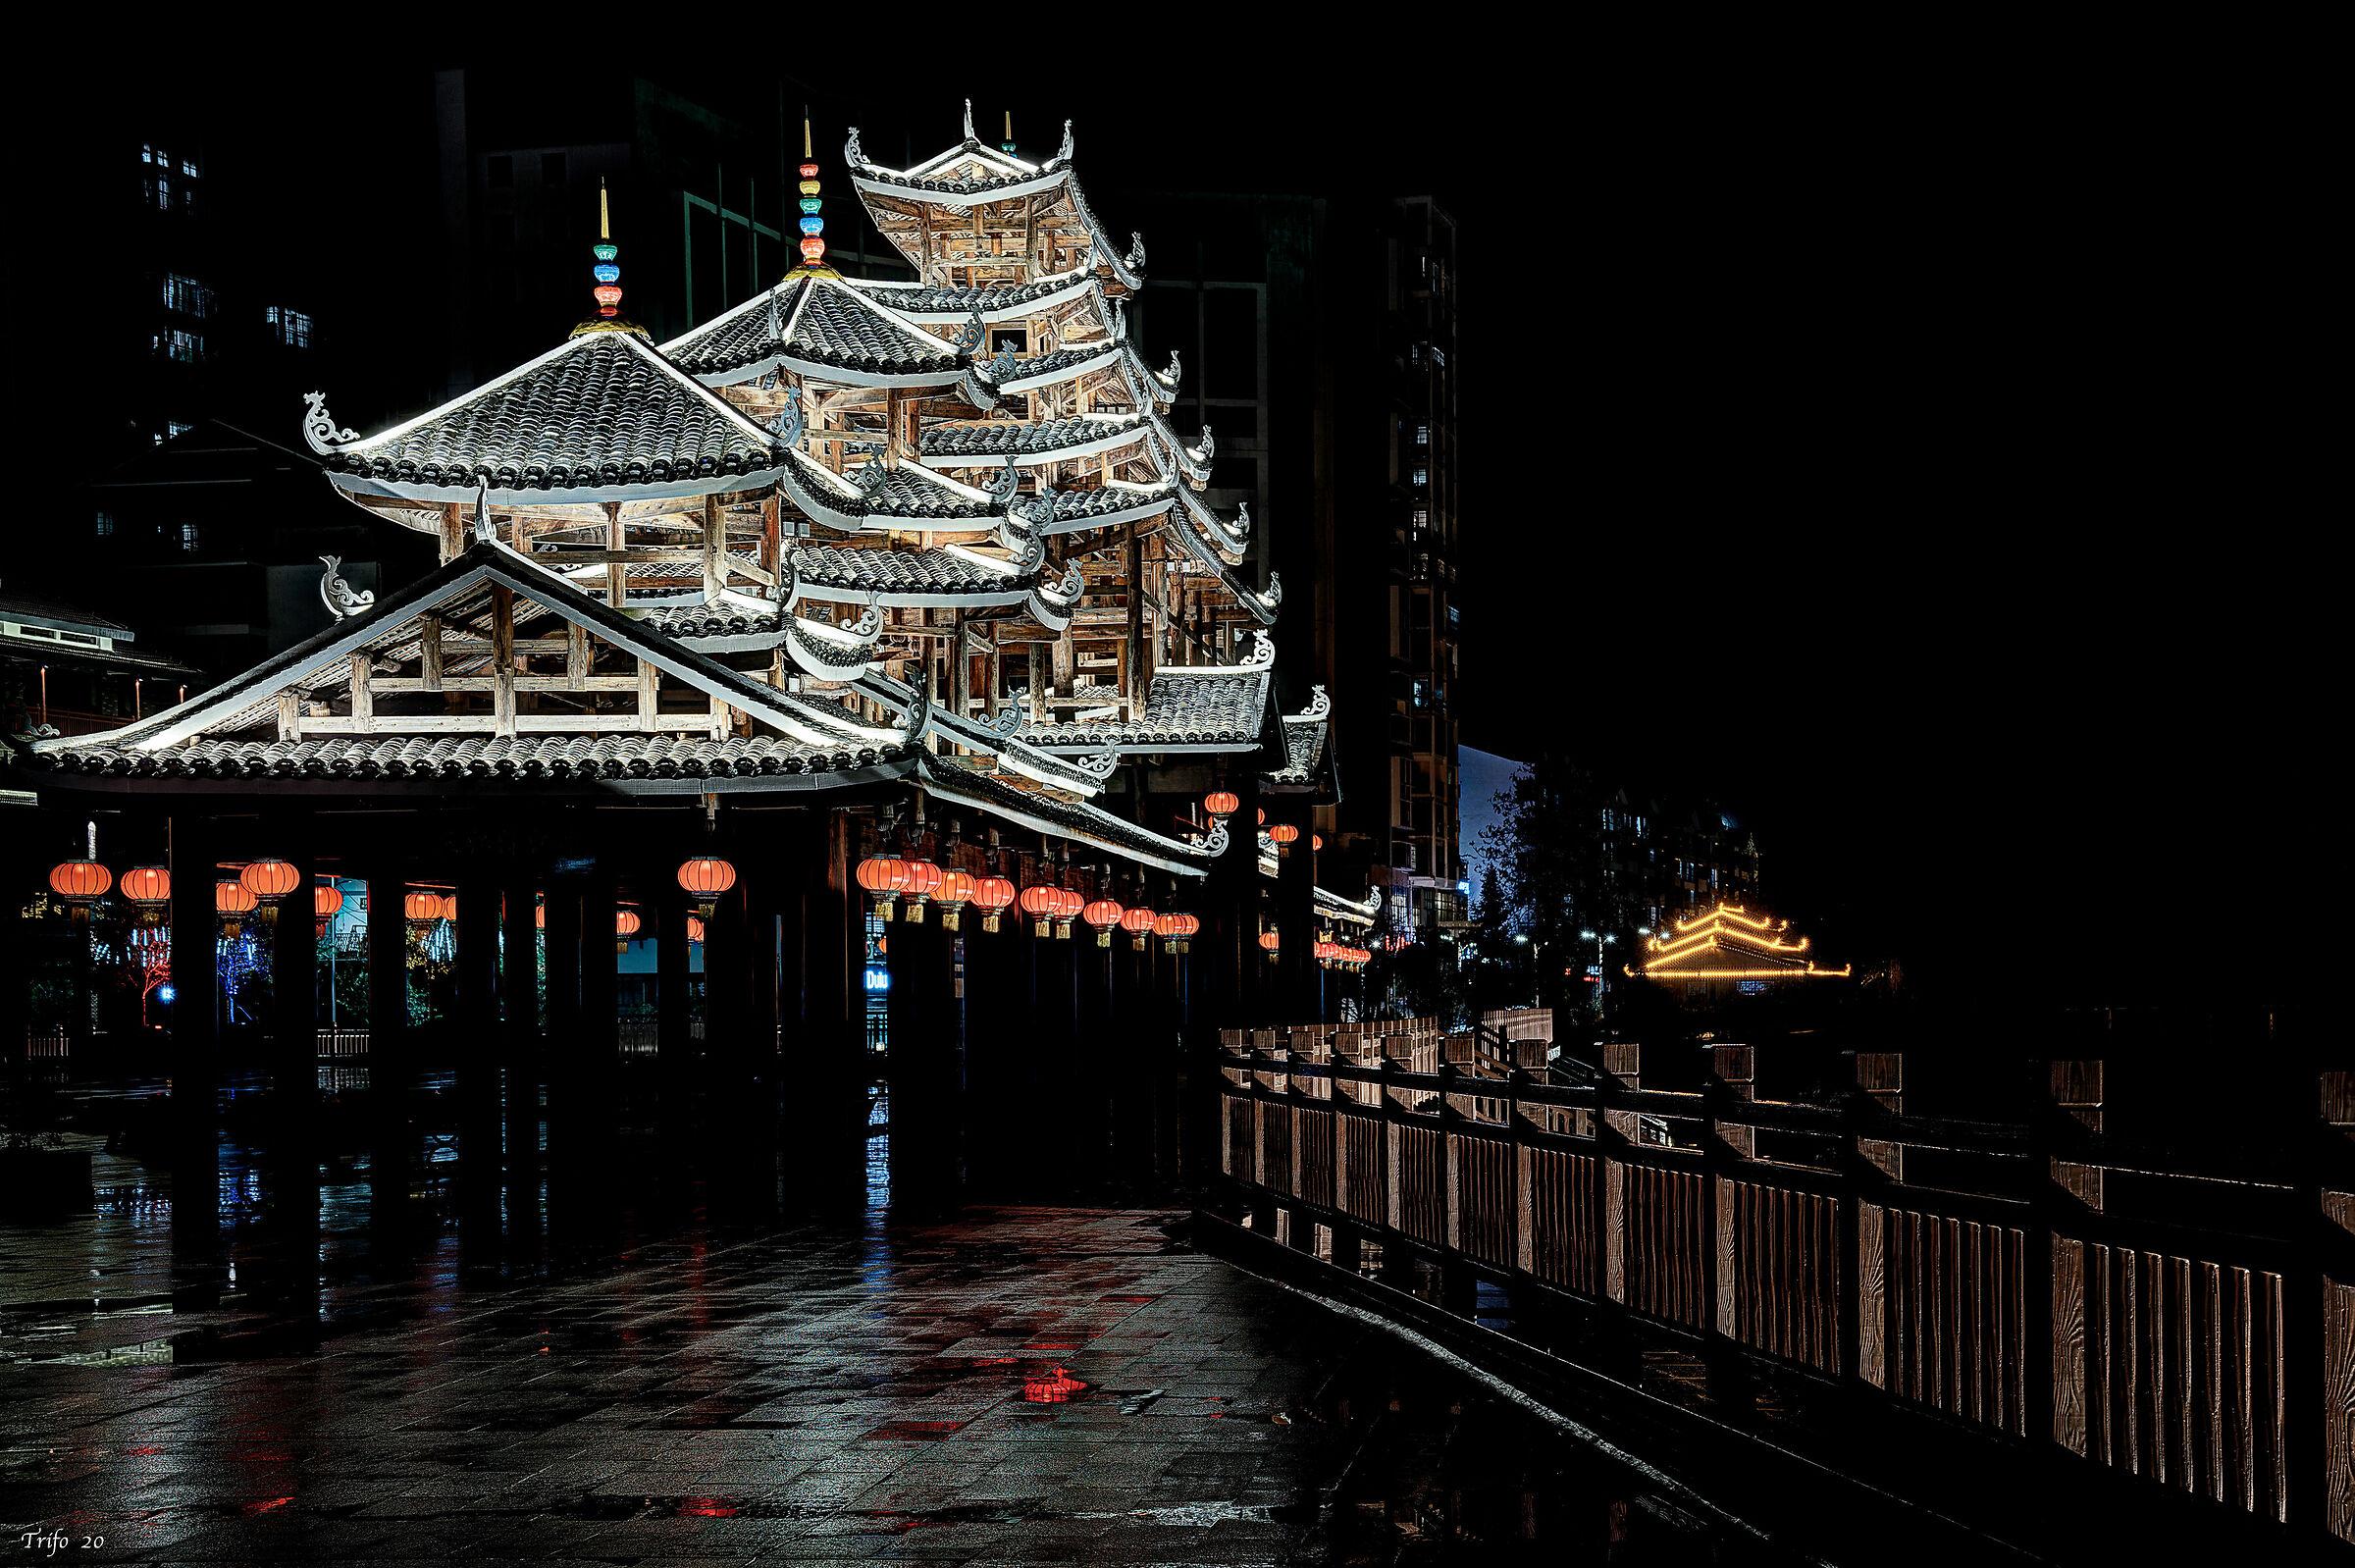 Night lights in Guizhou ........